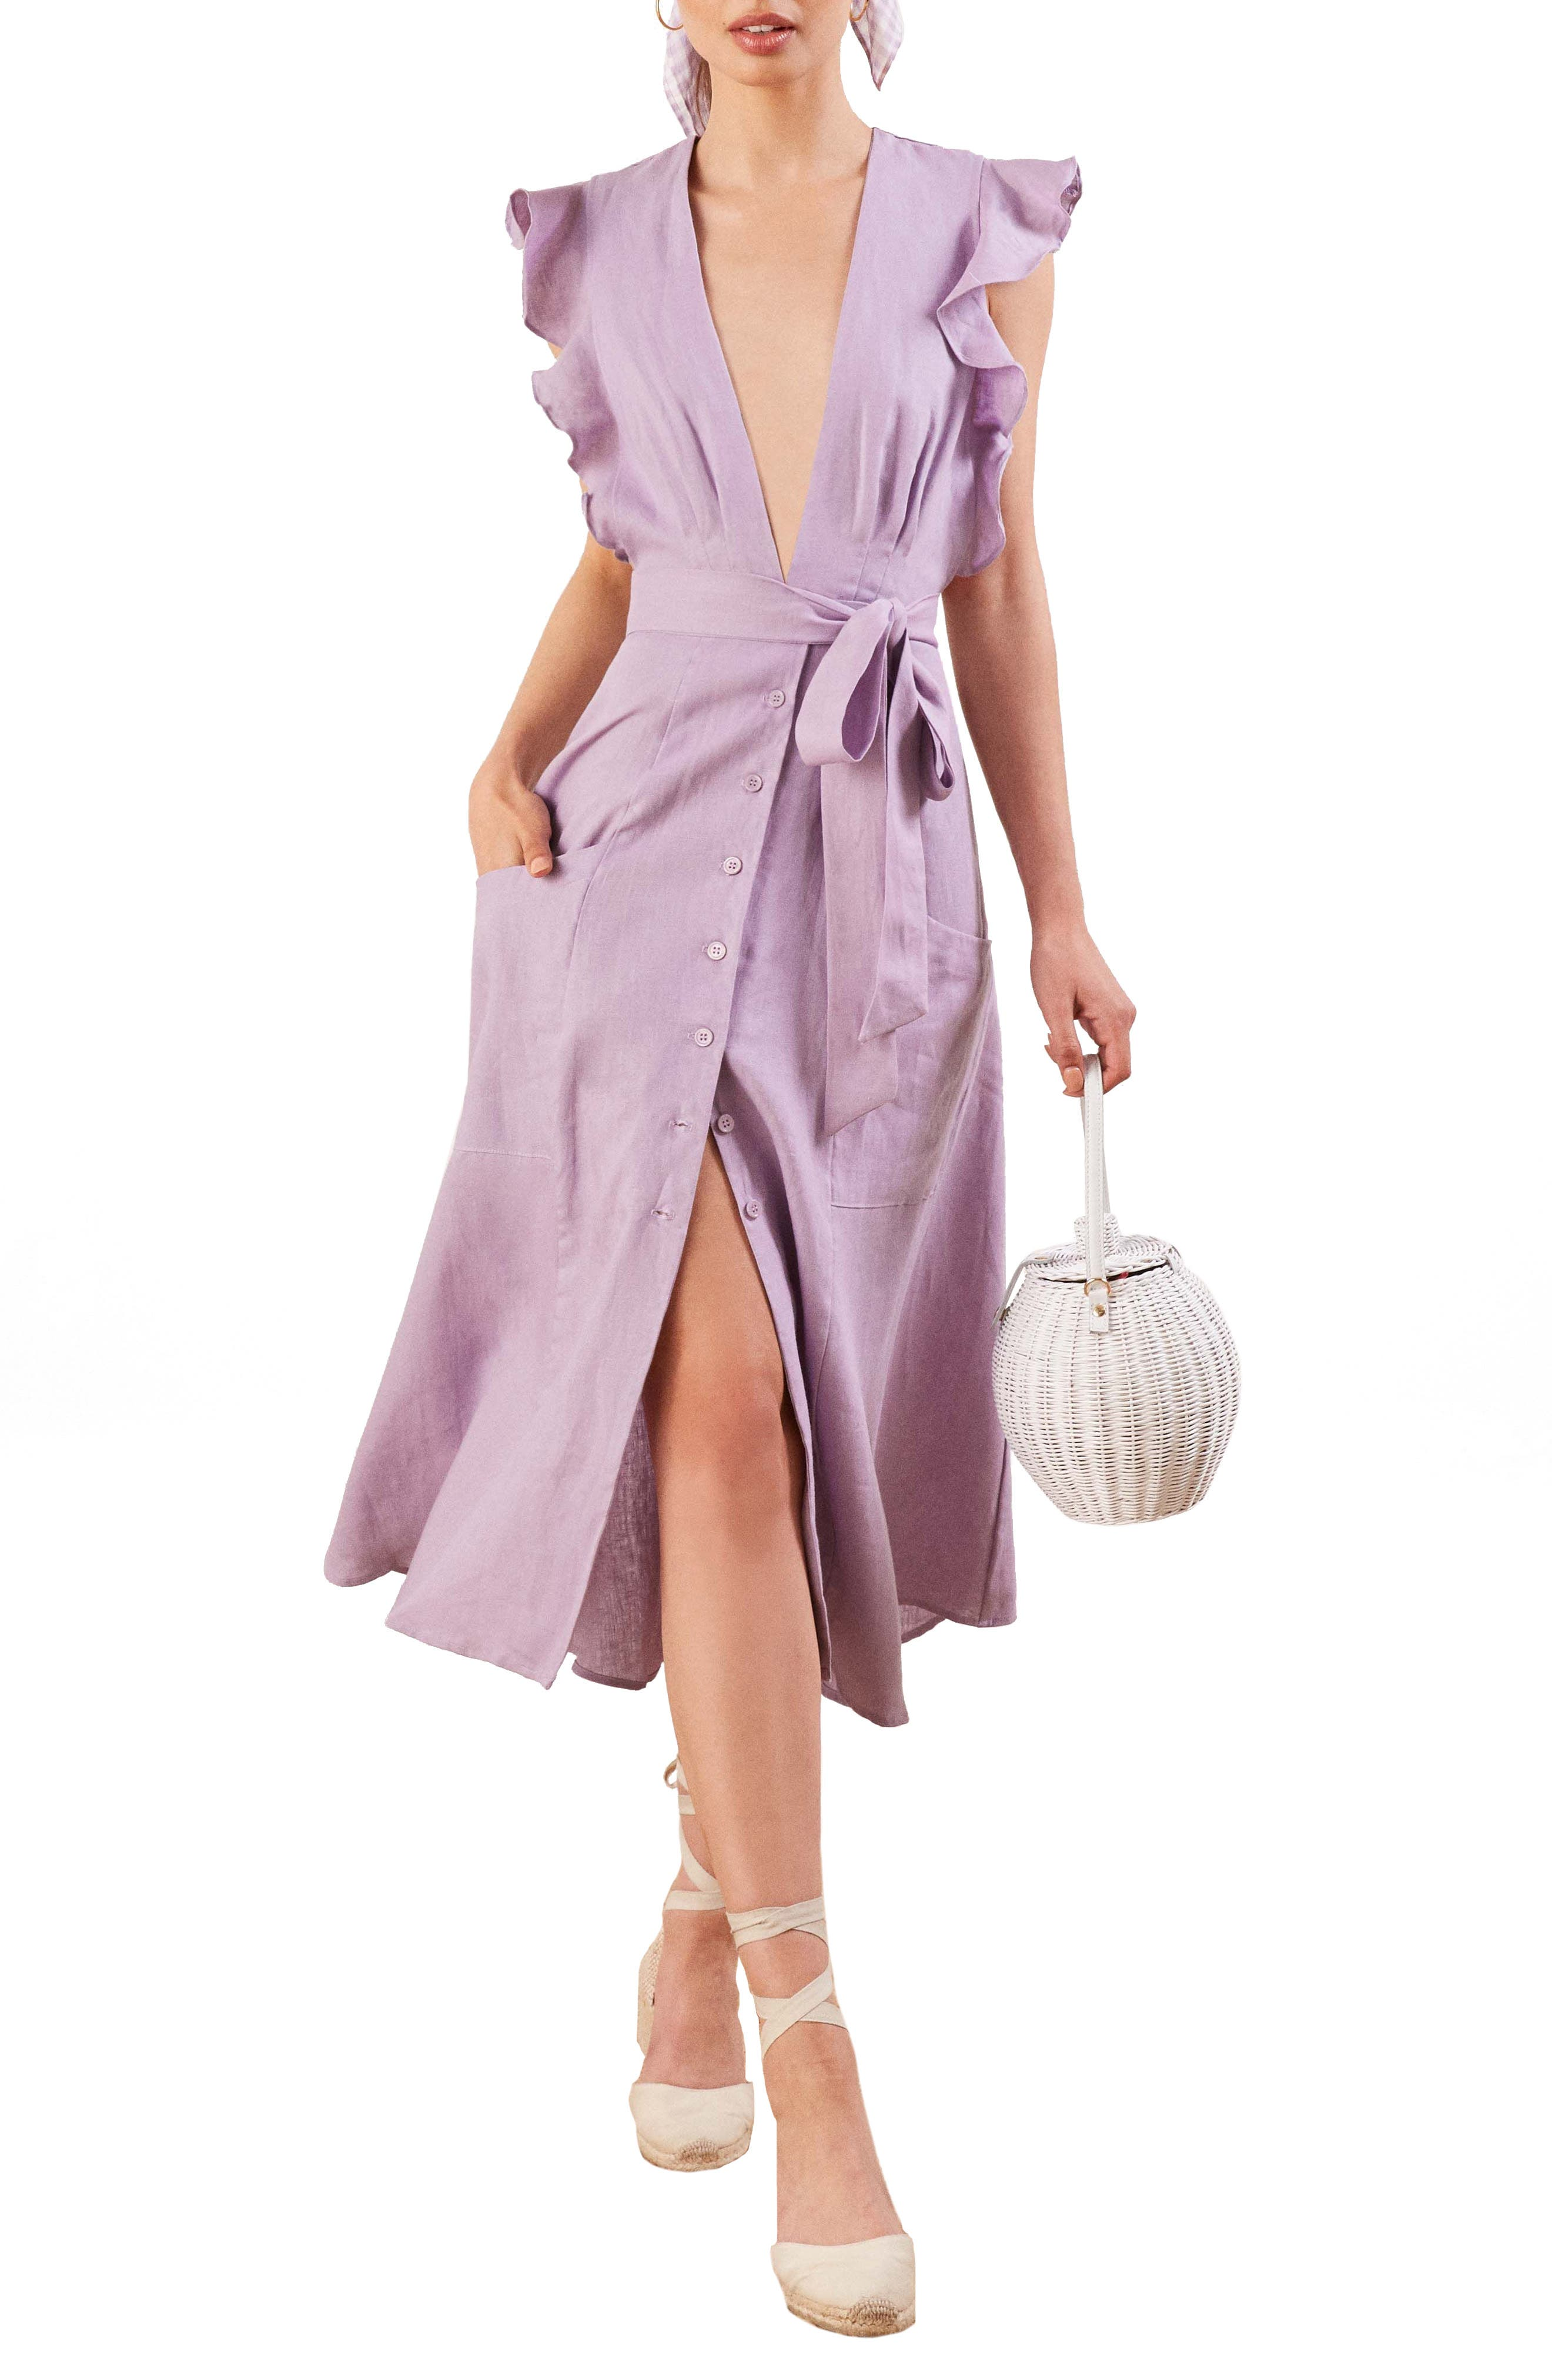 Serengeti Linen Dress,                             Main thumbnail 1, color,                             500